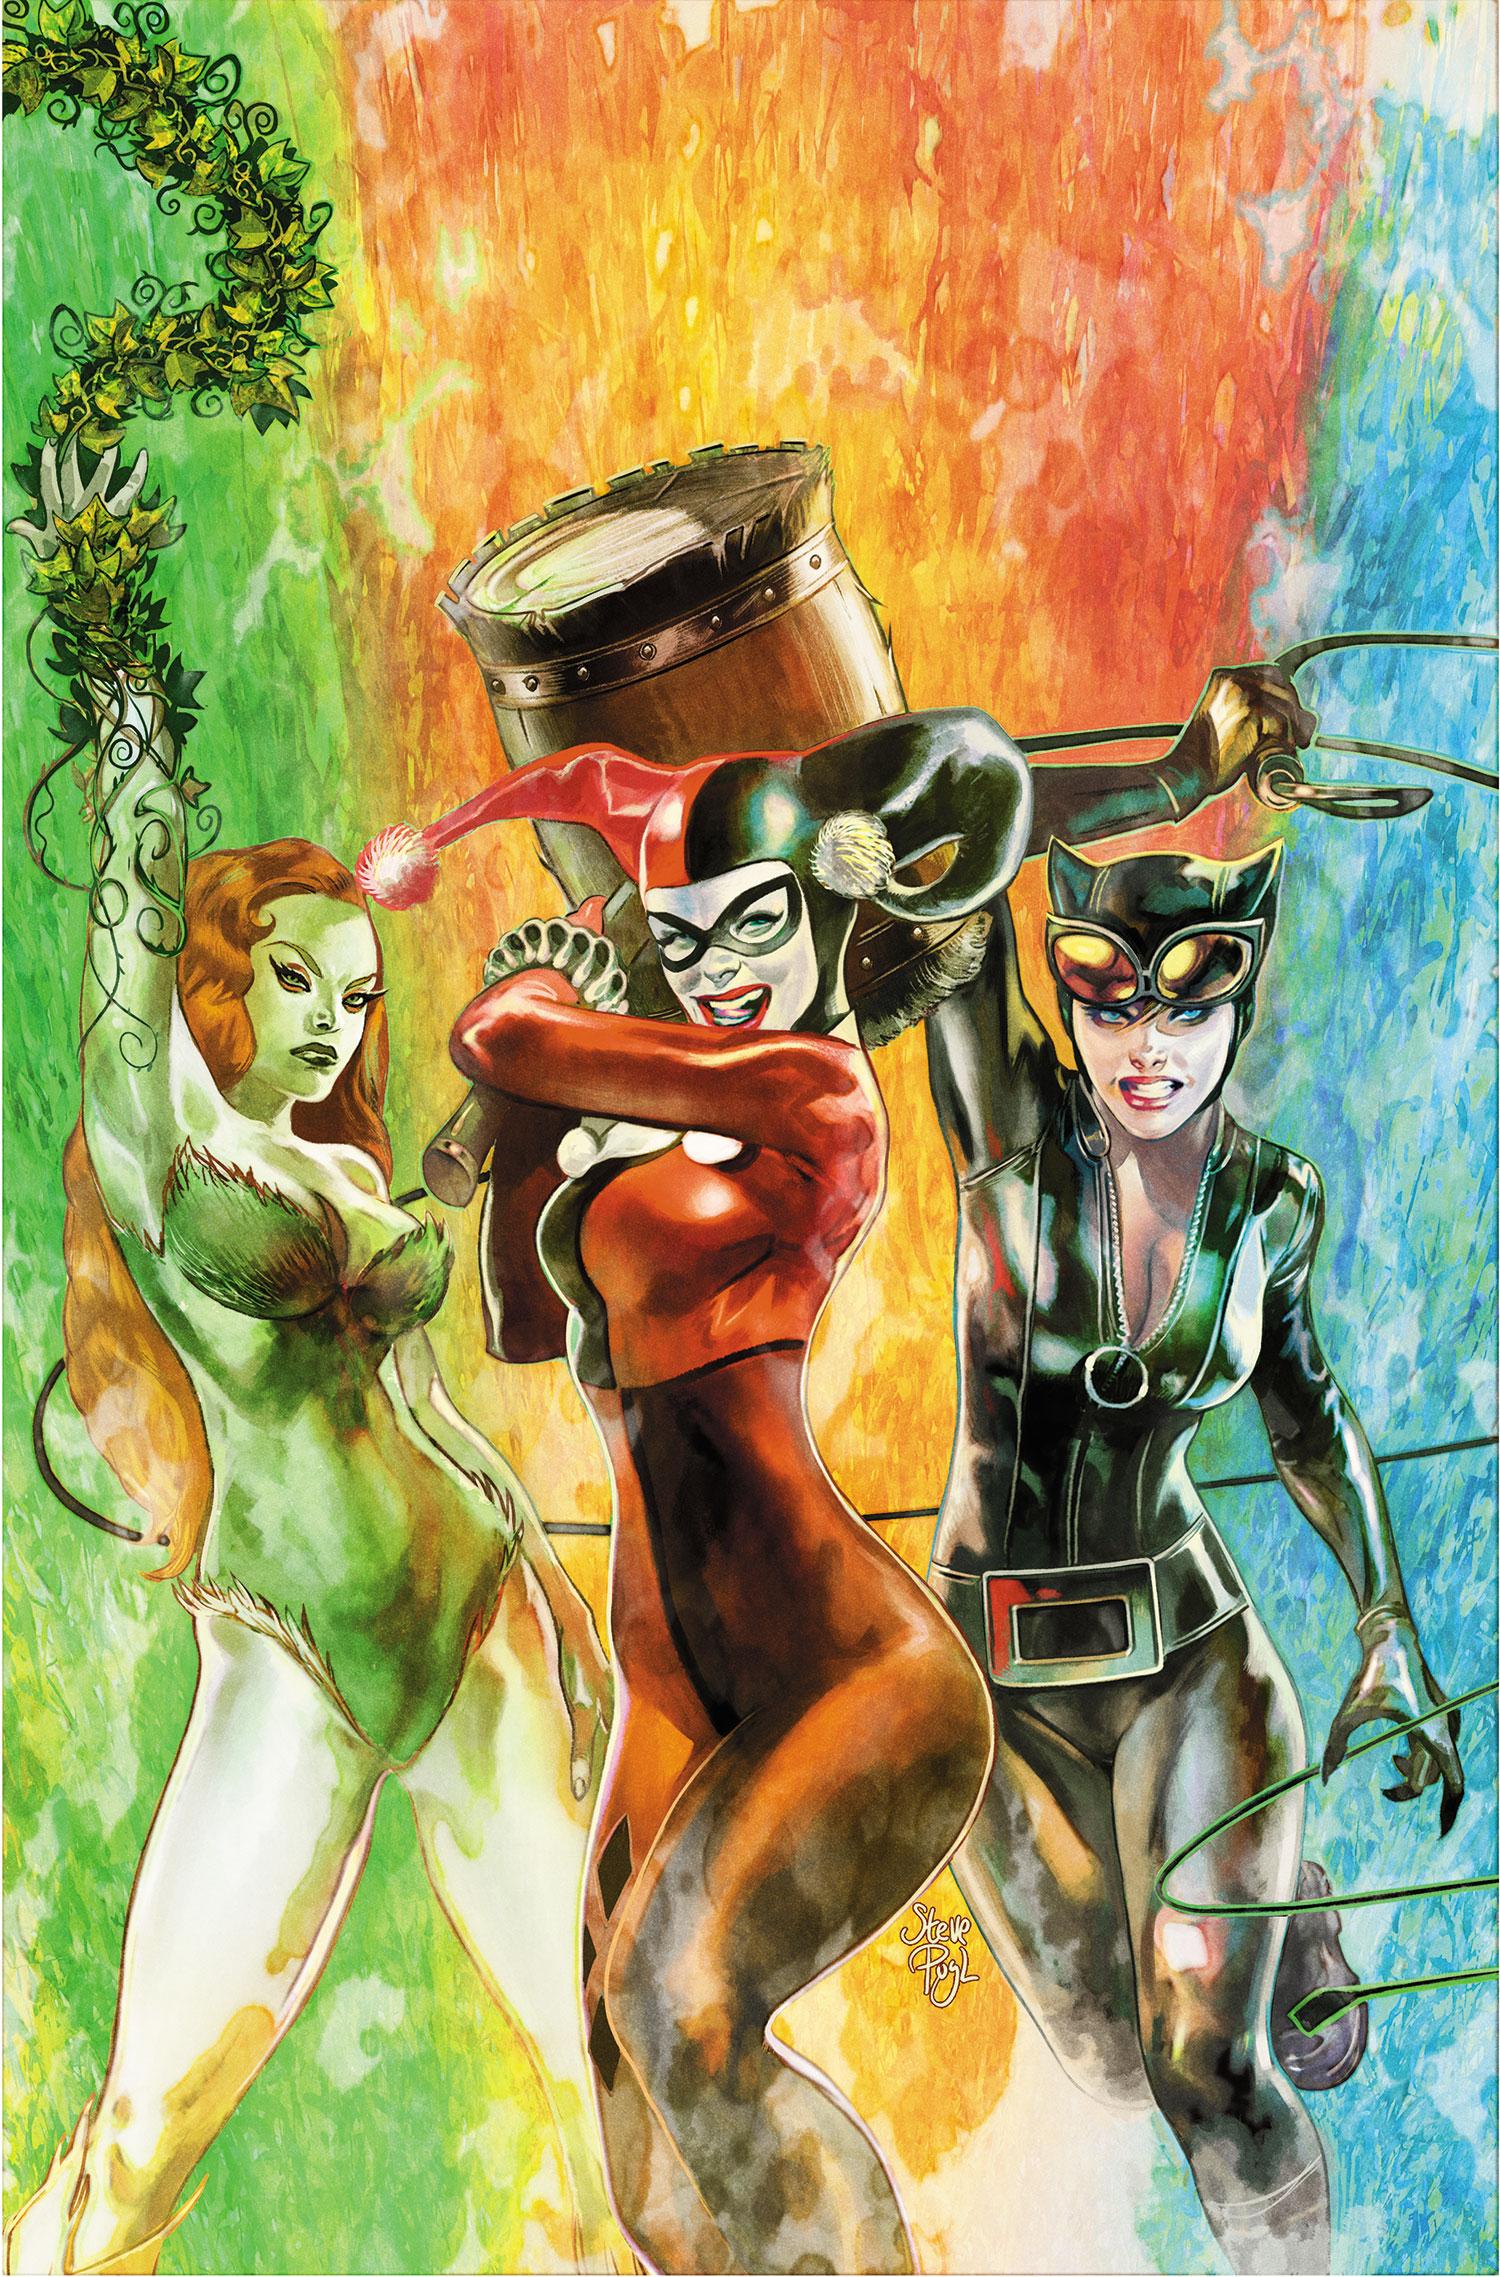 Convergence Harley Quinn Vol 1 1 Textless.jpg